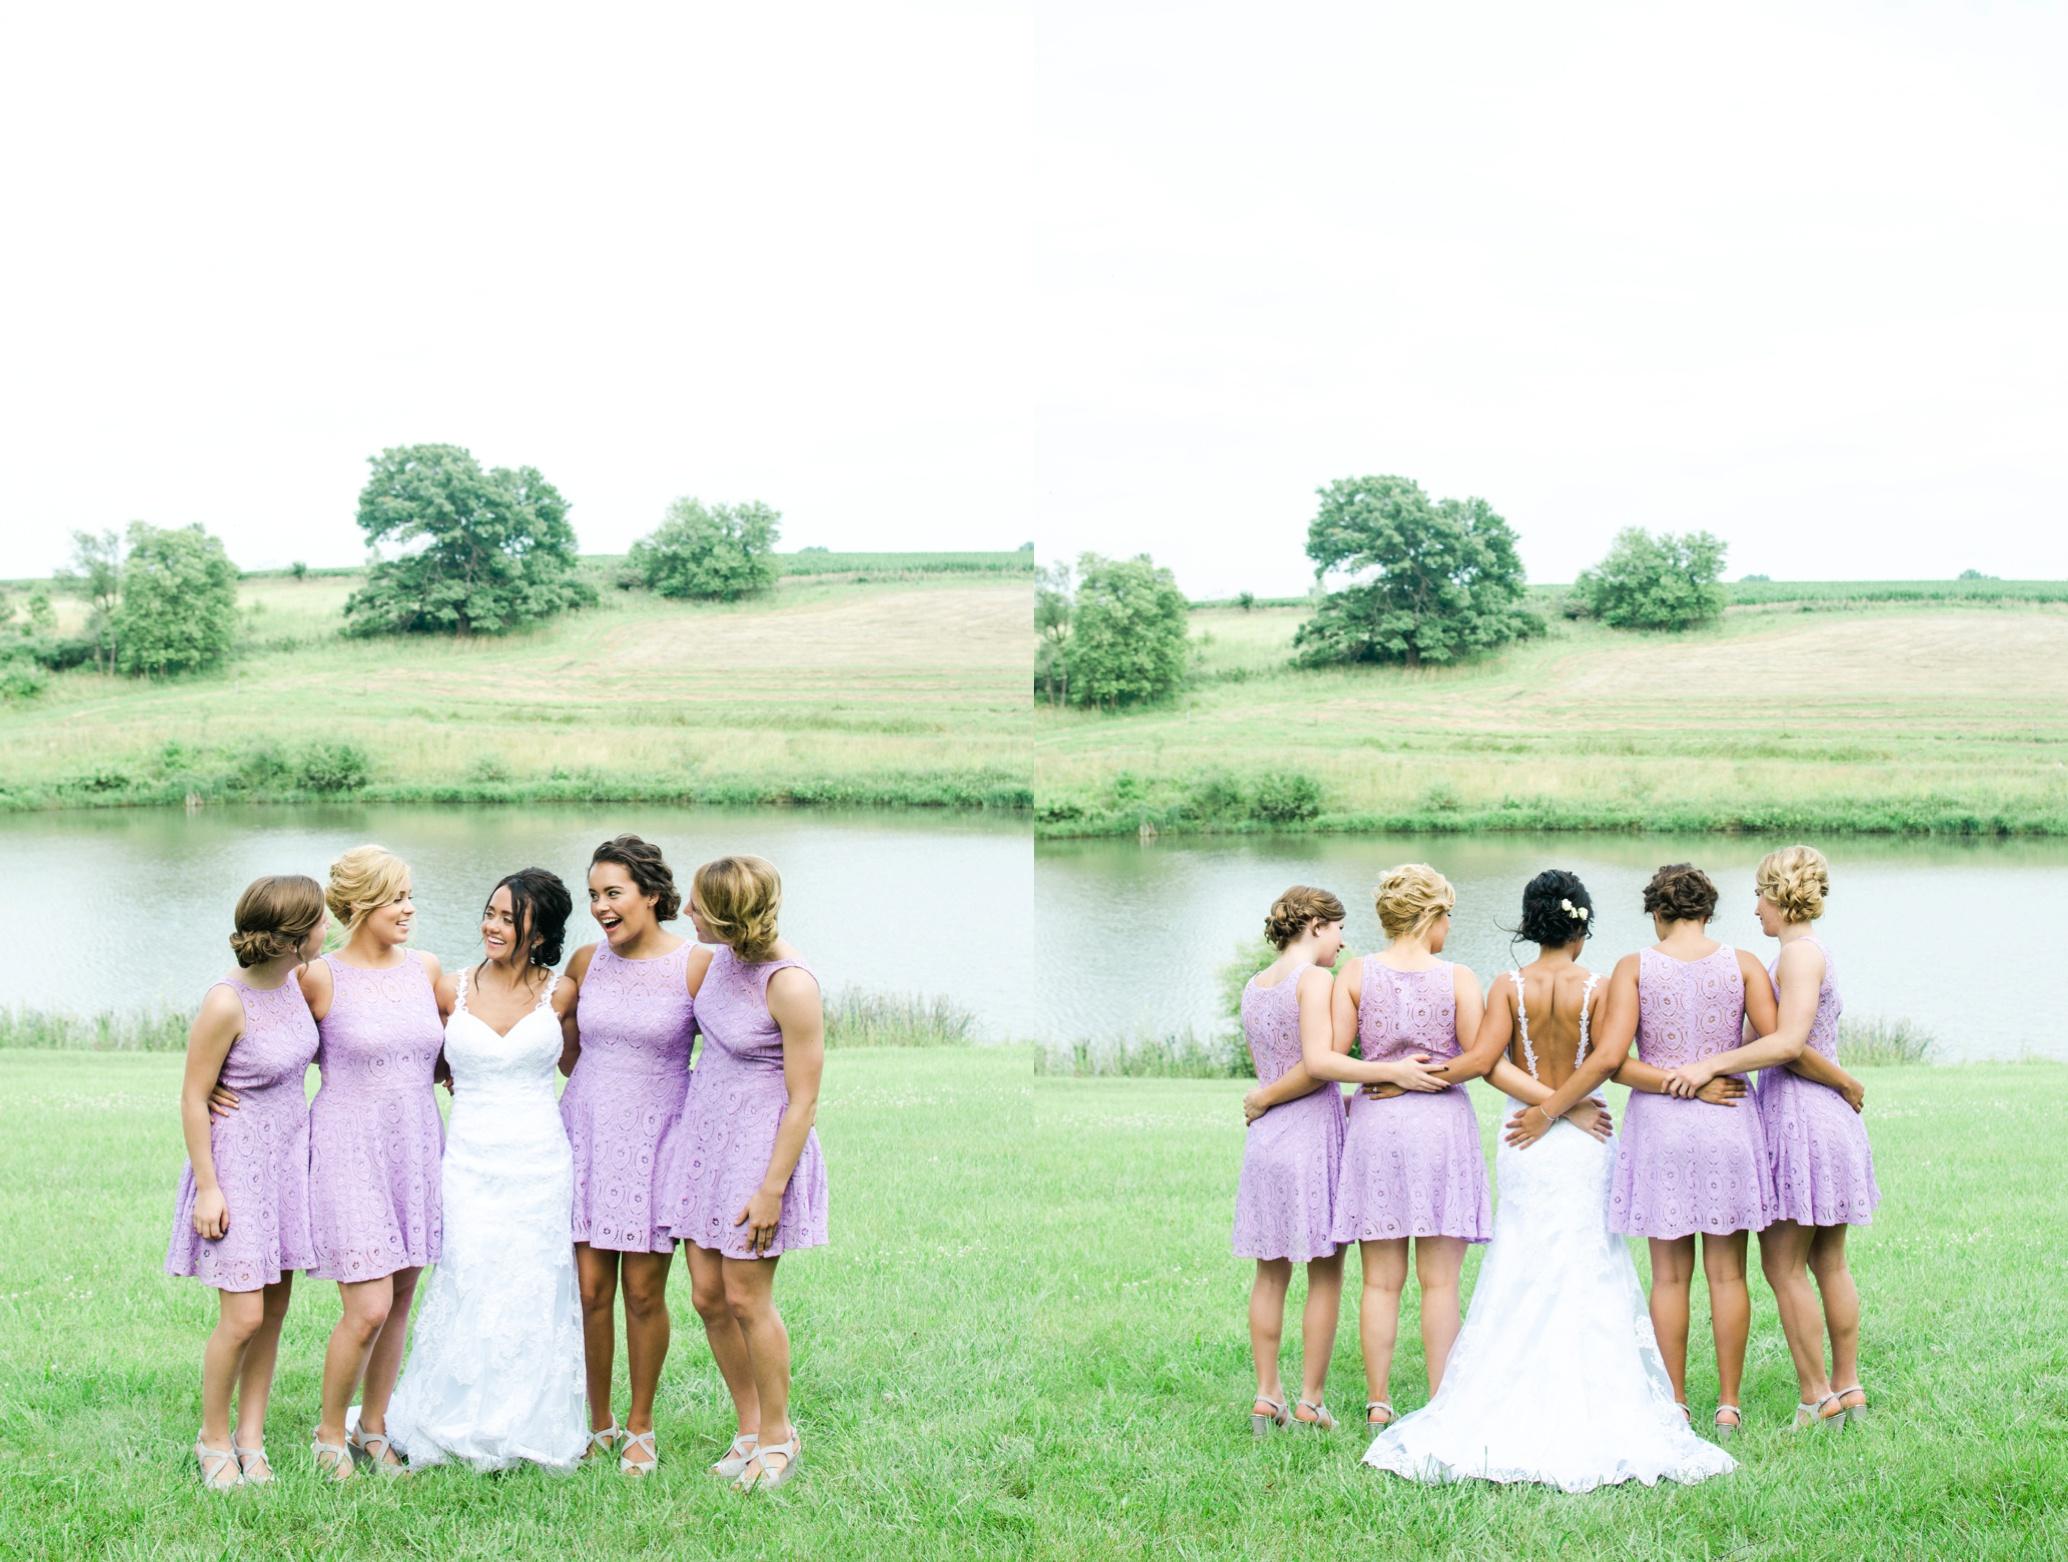 Barnes' Place Rustic Outdoor Wedding | Ali Leigh Photo Minneapolis Wedding Photographer_0144.jpg